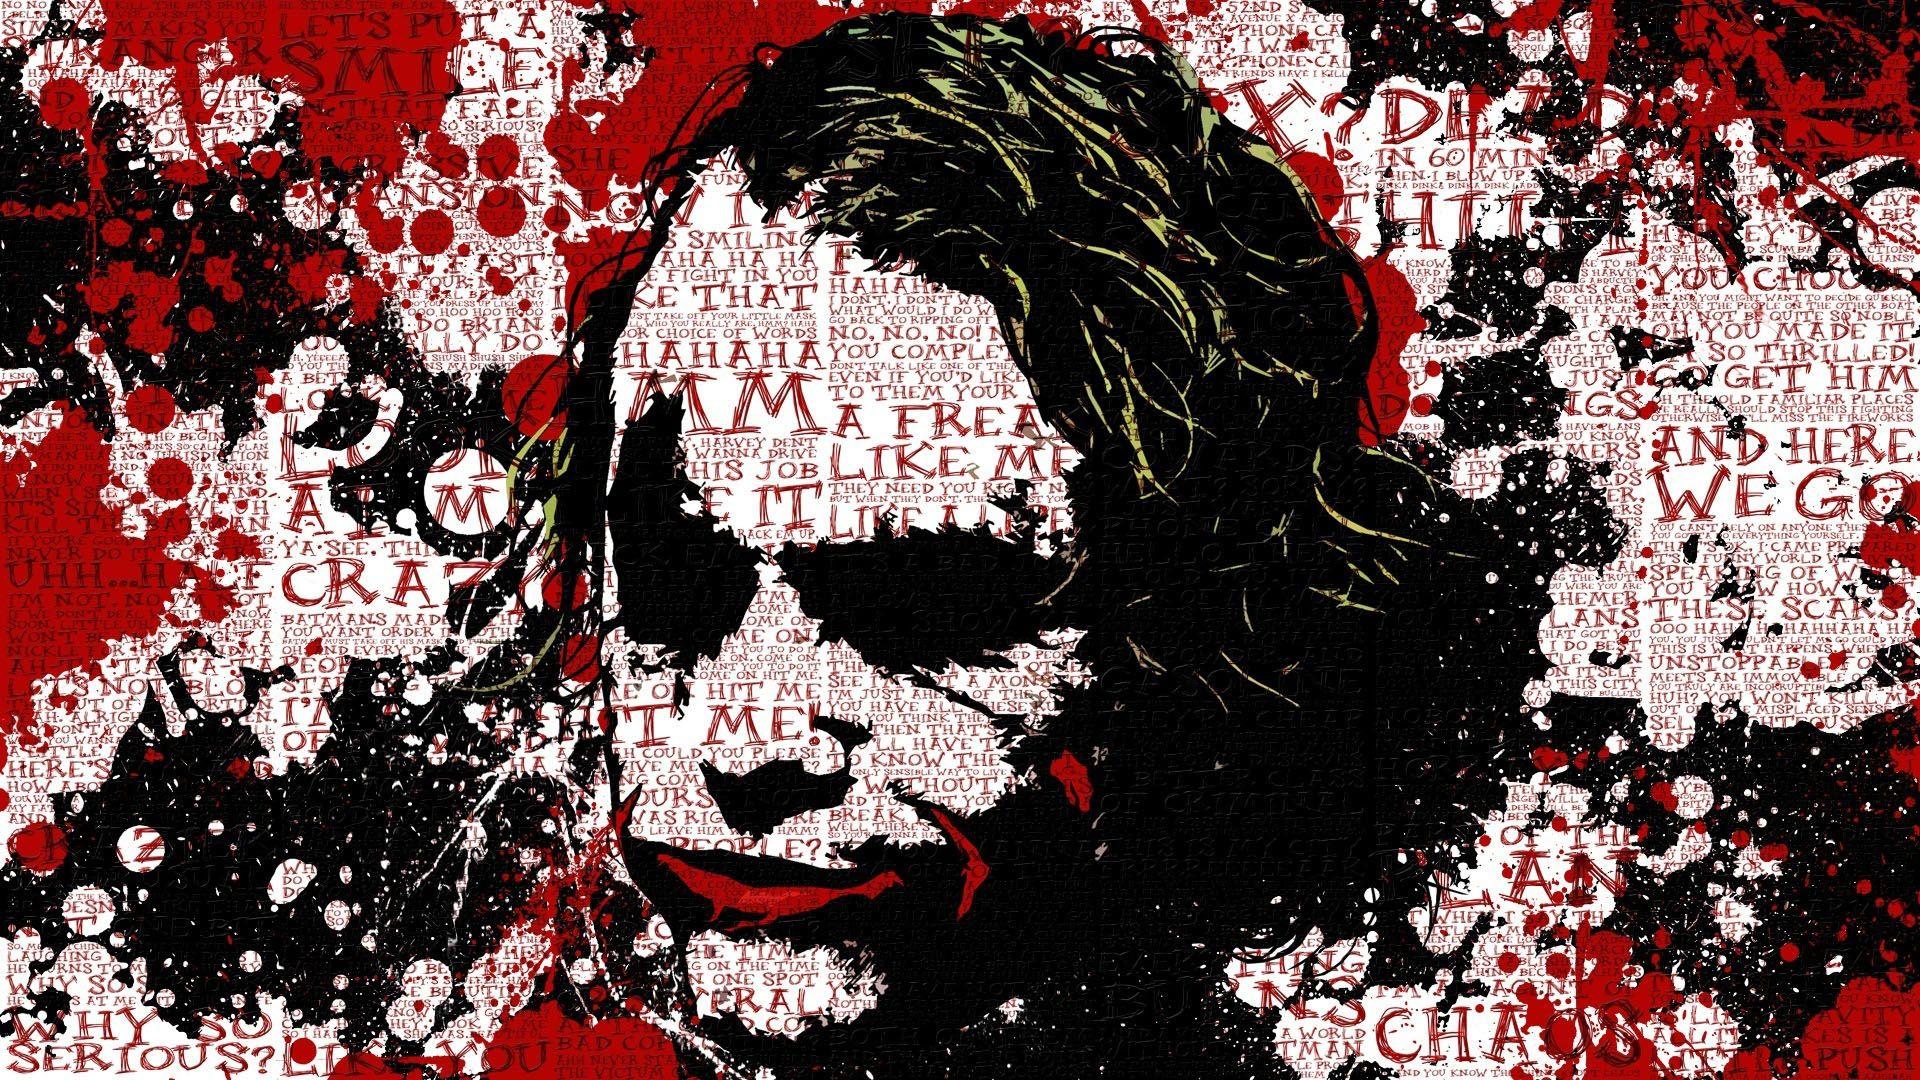 47 Joker Hd Wallpapers 1080p On Wallpapersafari Joker Wallpapers Joker Hd Wallpaper Dark Knight Wallpaper